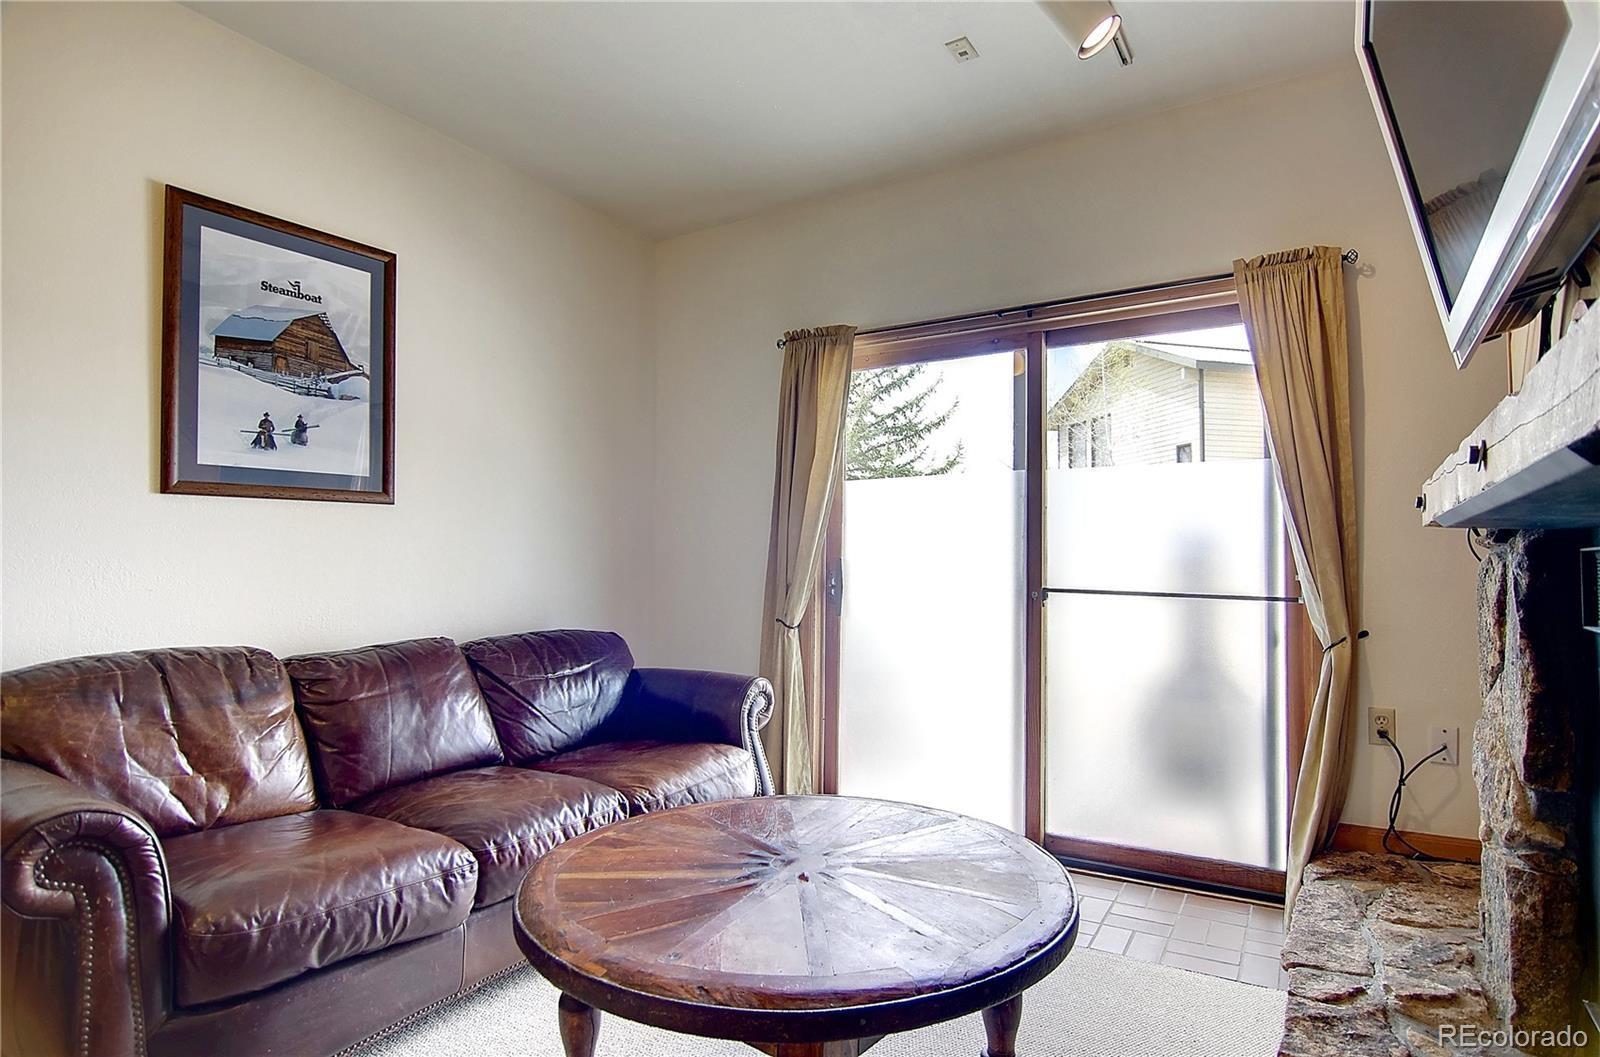 MLS# 2309963 - 29 - 1145 Overlook Drive #C1, Steamboat Springs, CO 80487